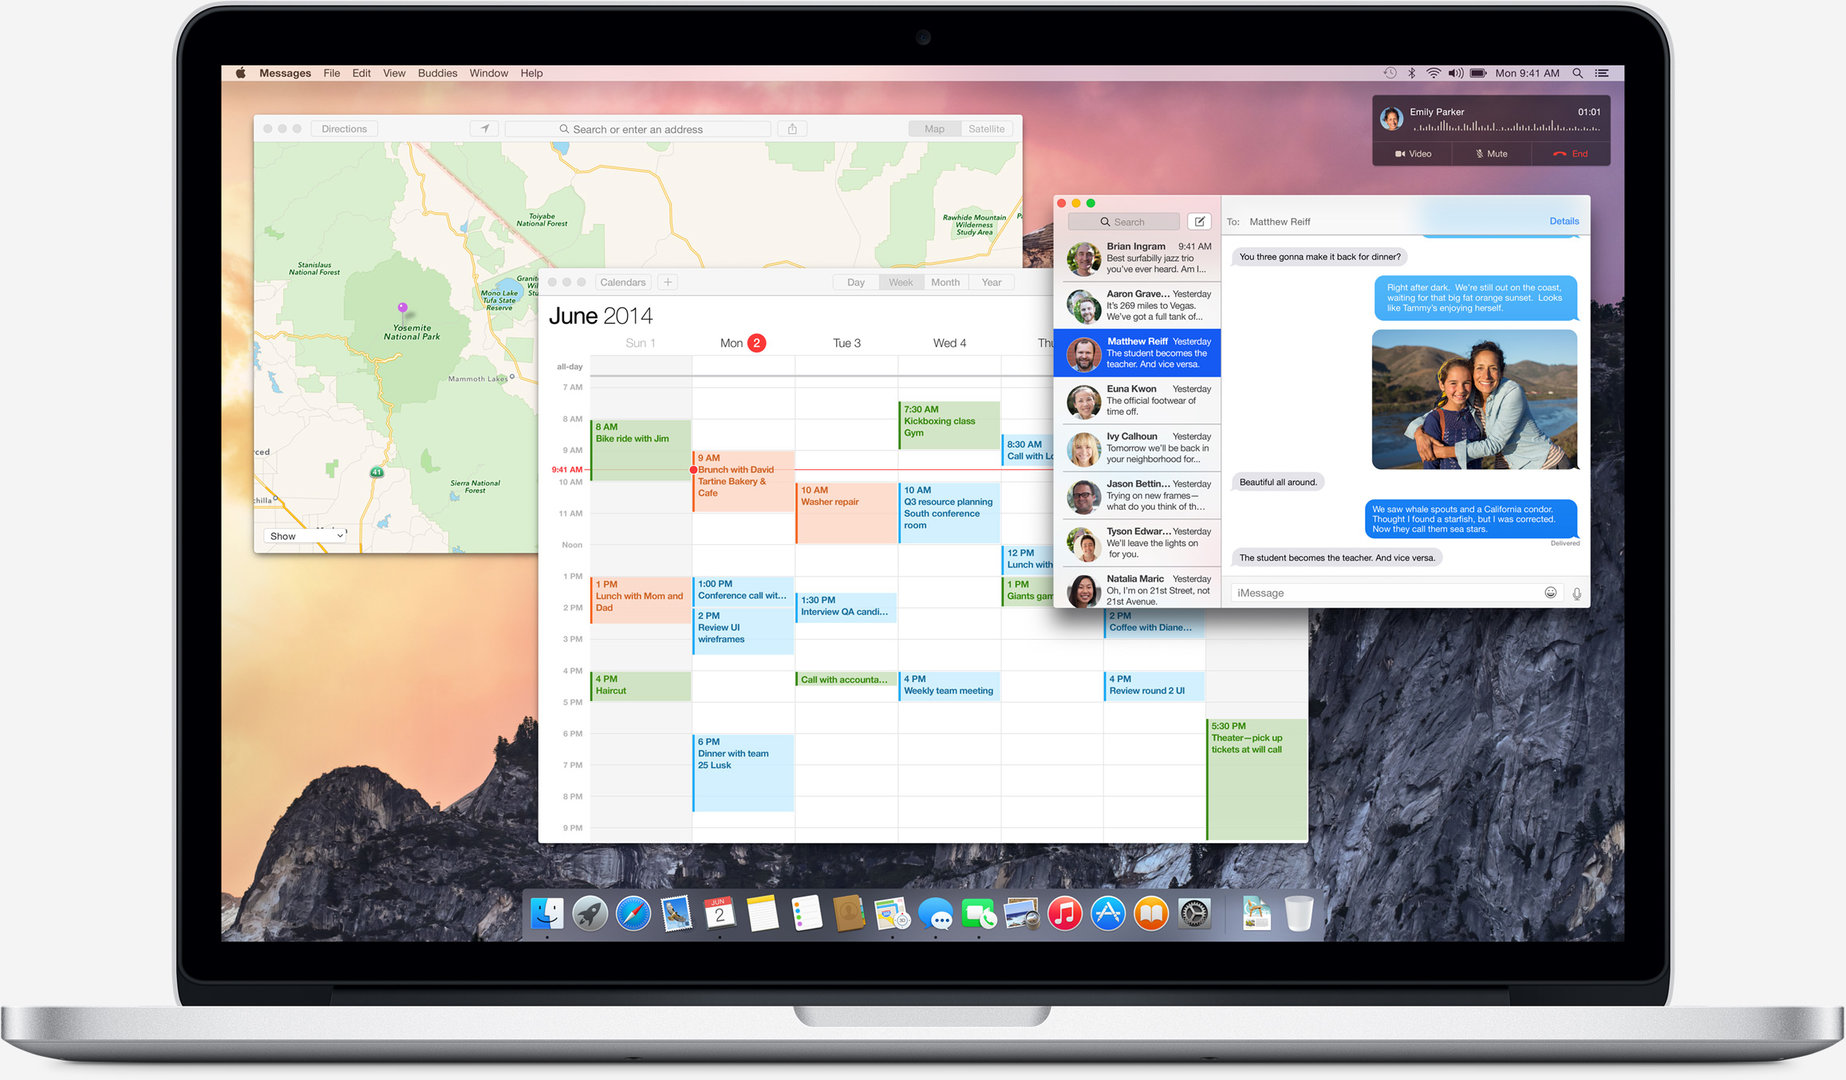 Neues Design in OS X 10.10